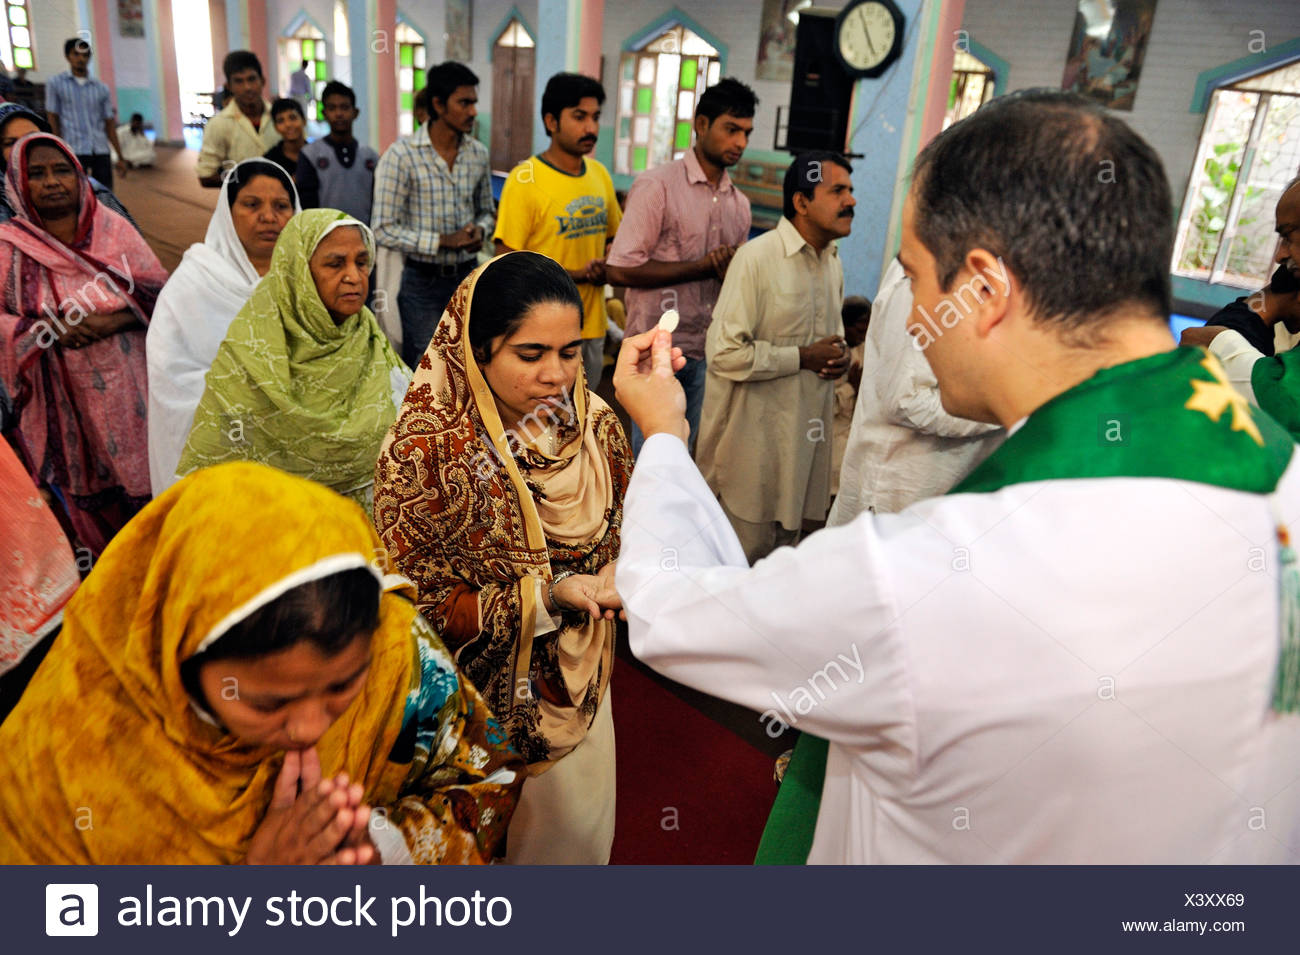 Mass, veiled women receiving Communion, Parish Church of St